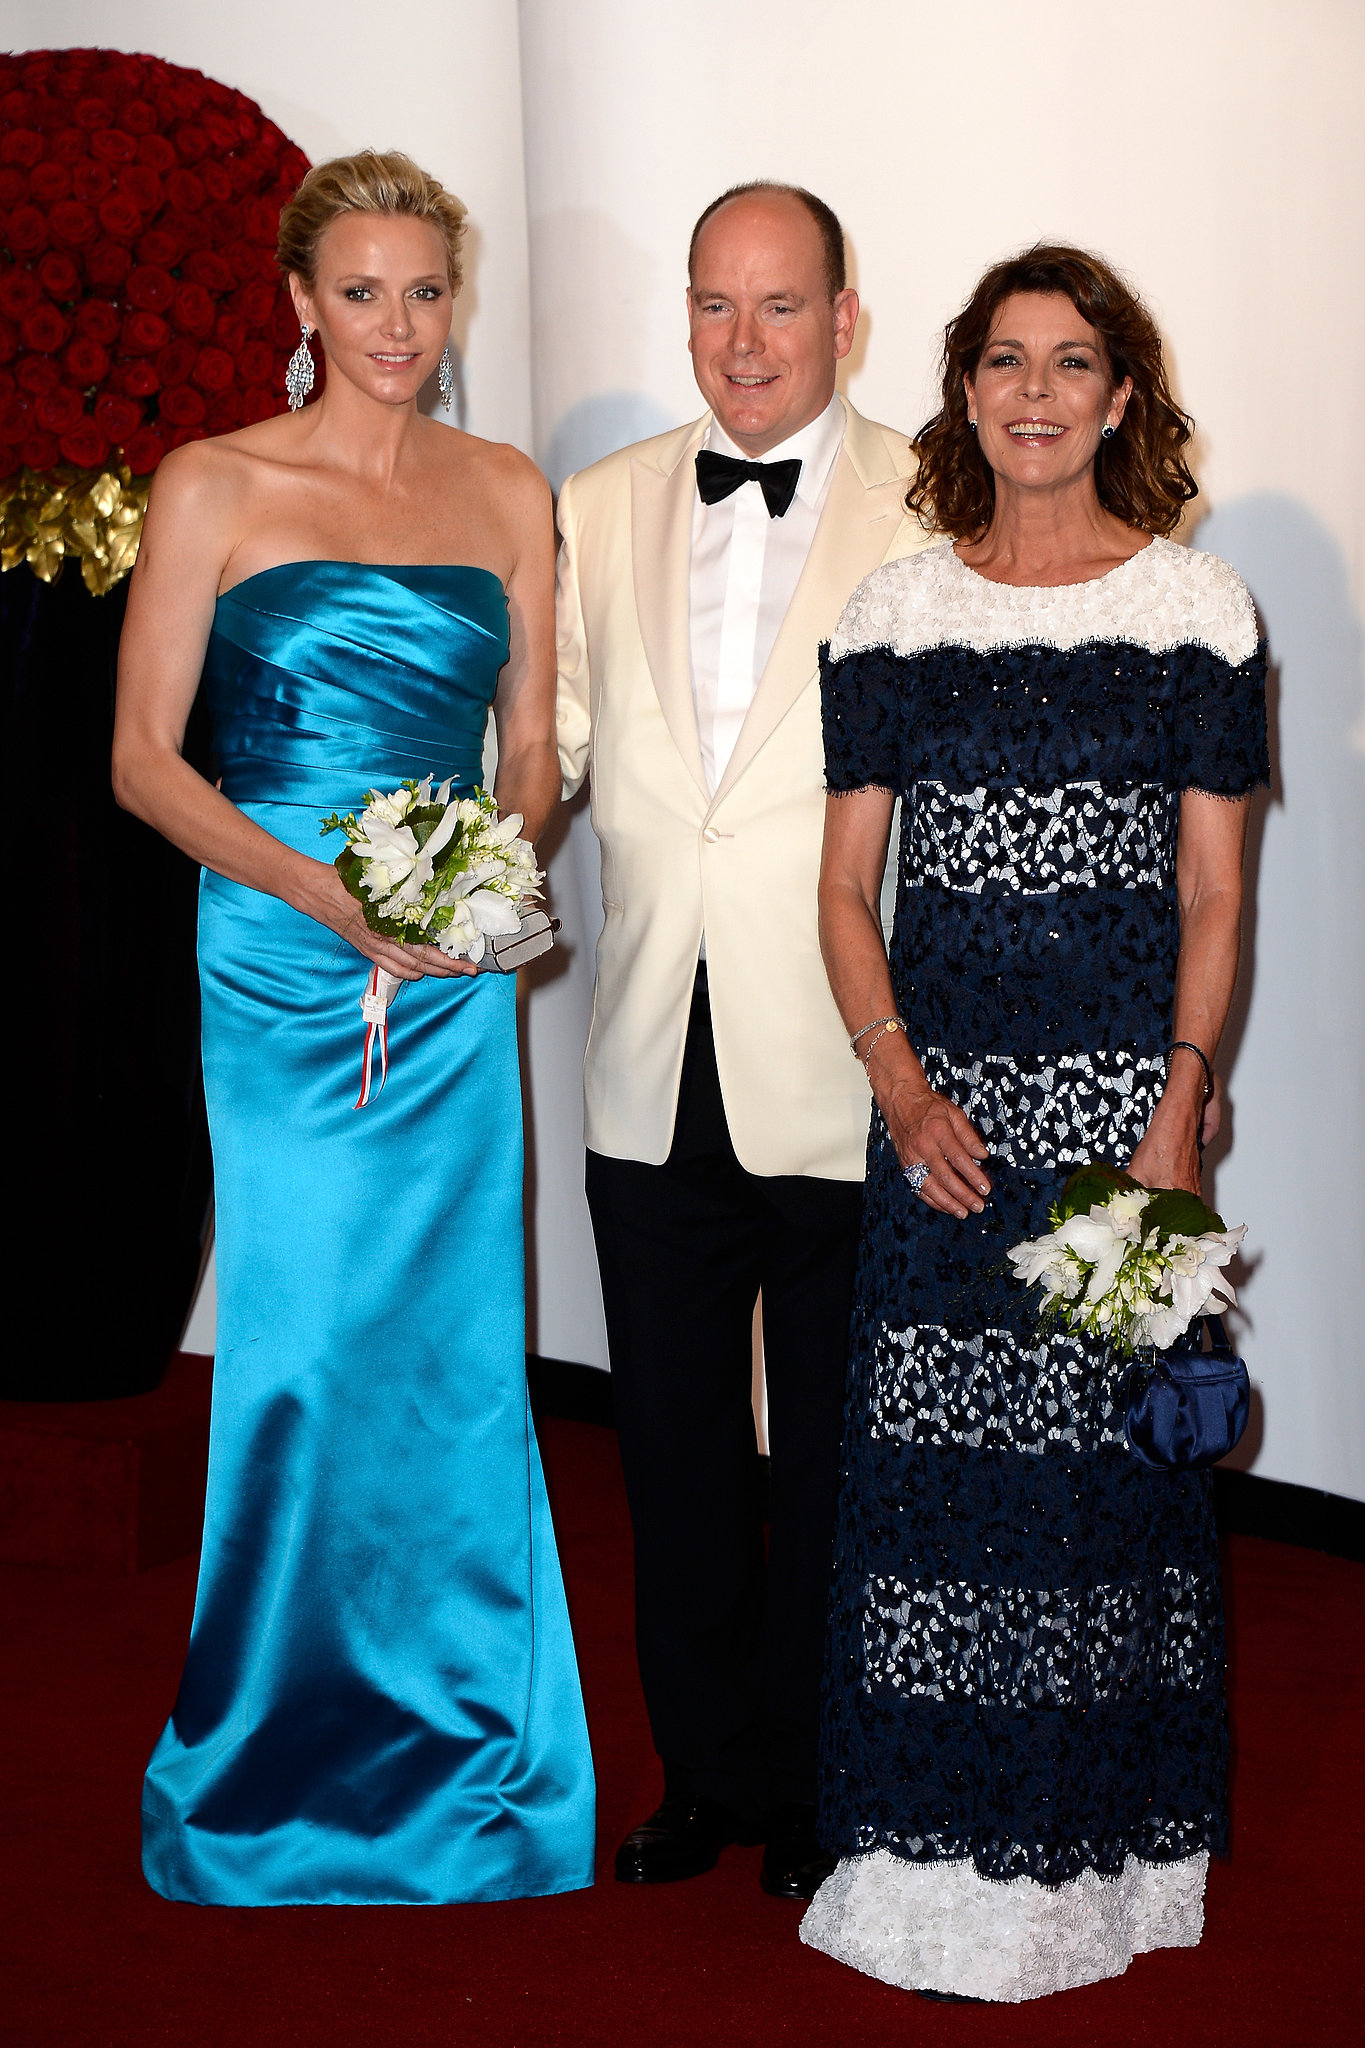 At the Monaco Red Cross Gala, Princess Charlene of Monaco, Prince Albert II of Monaco, and Princess Caroline of Hanover were at their most elegant.